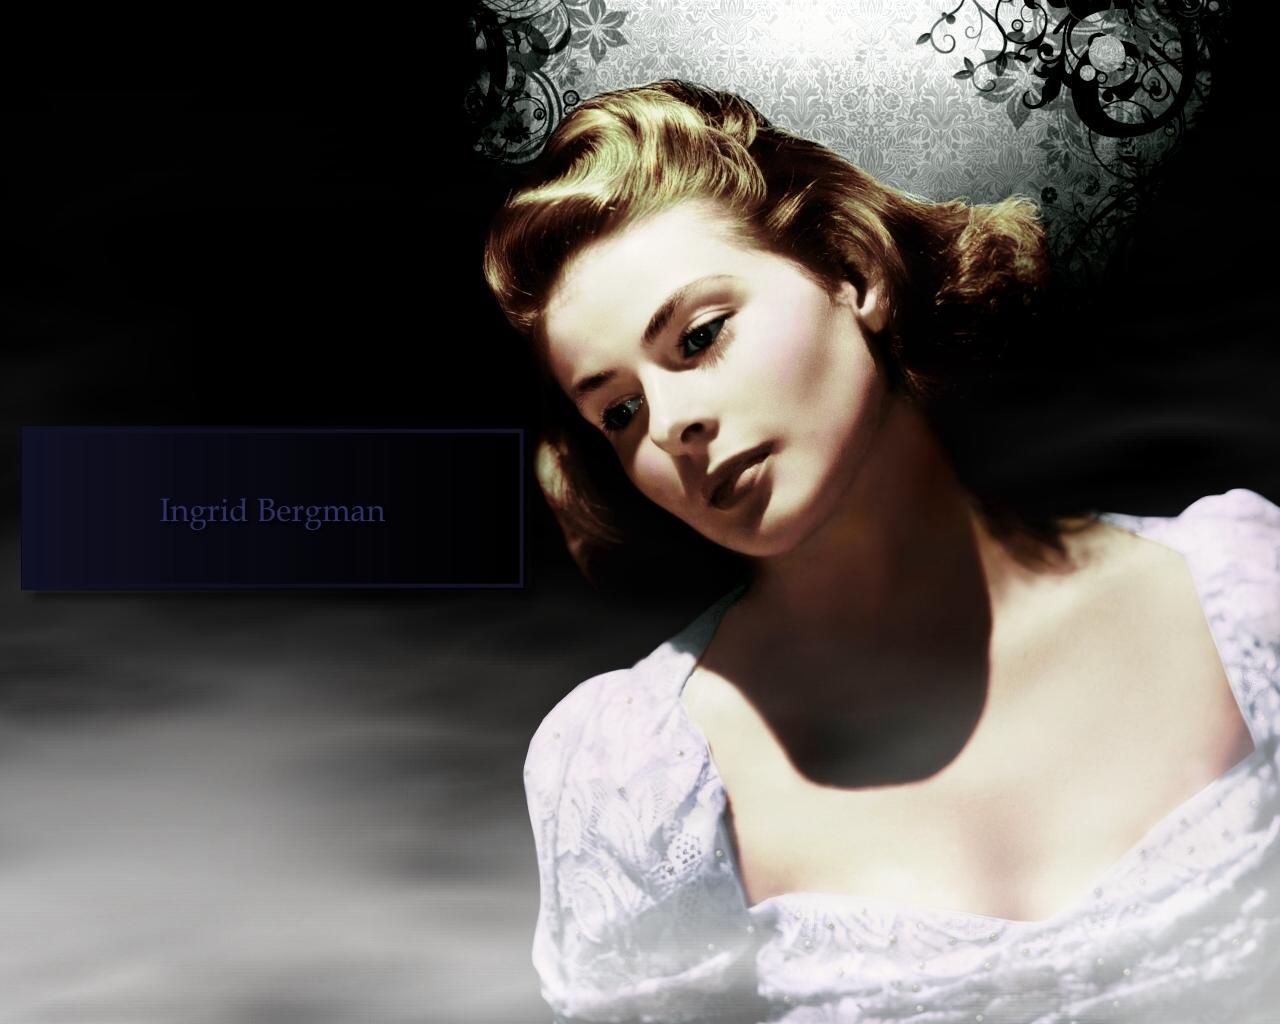 Ingrid Bergman2 1280x1024 1280x1024